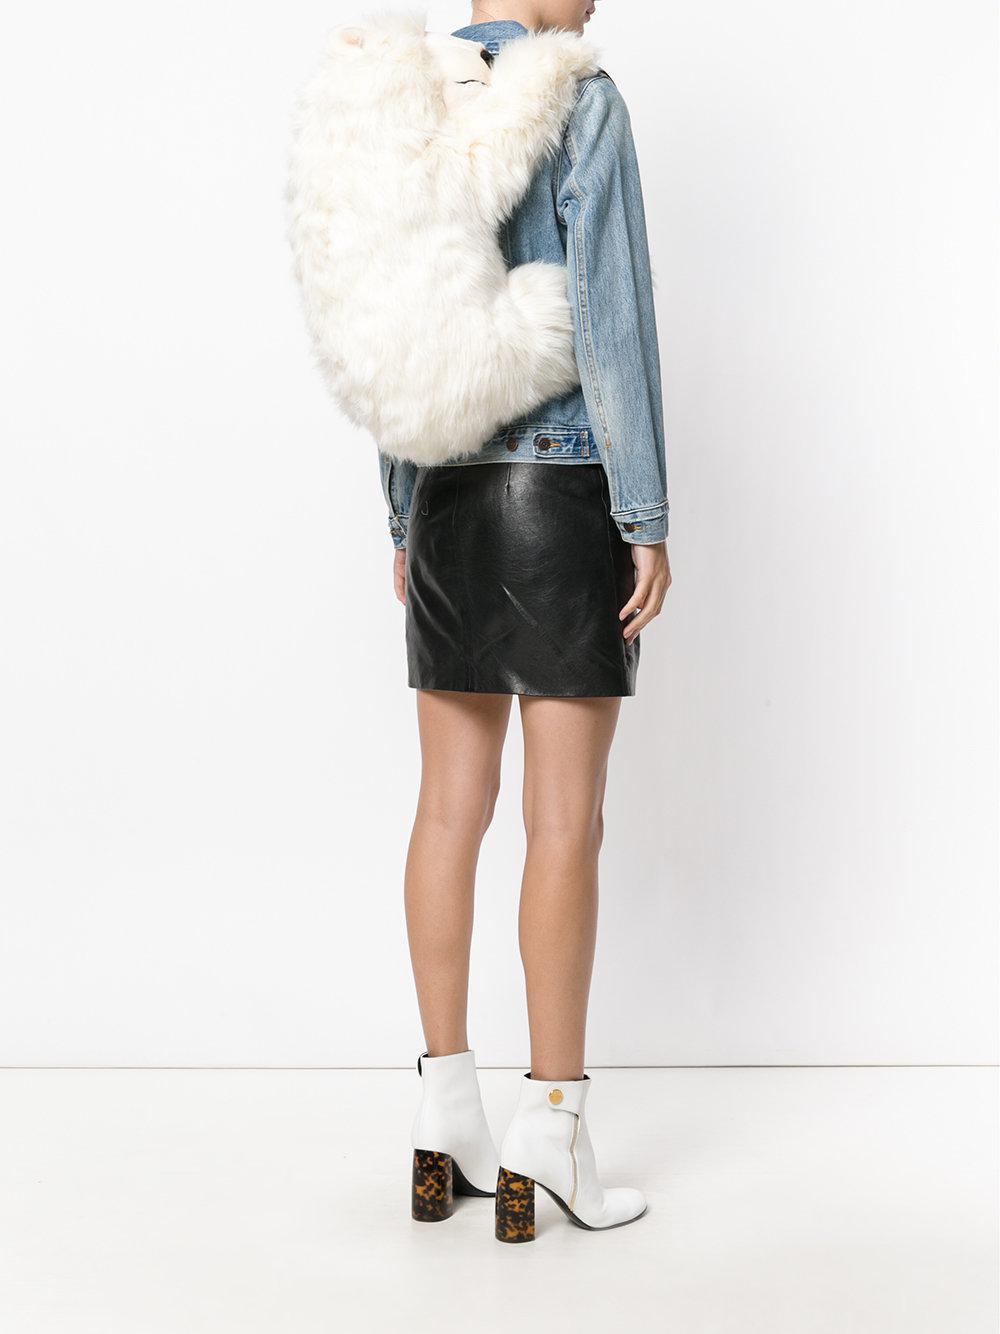 Dolce & Gabbana Leather Polar Bear Backpack in White